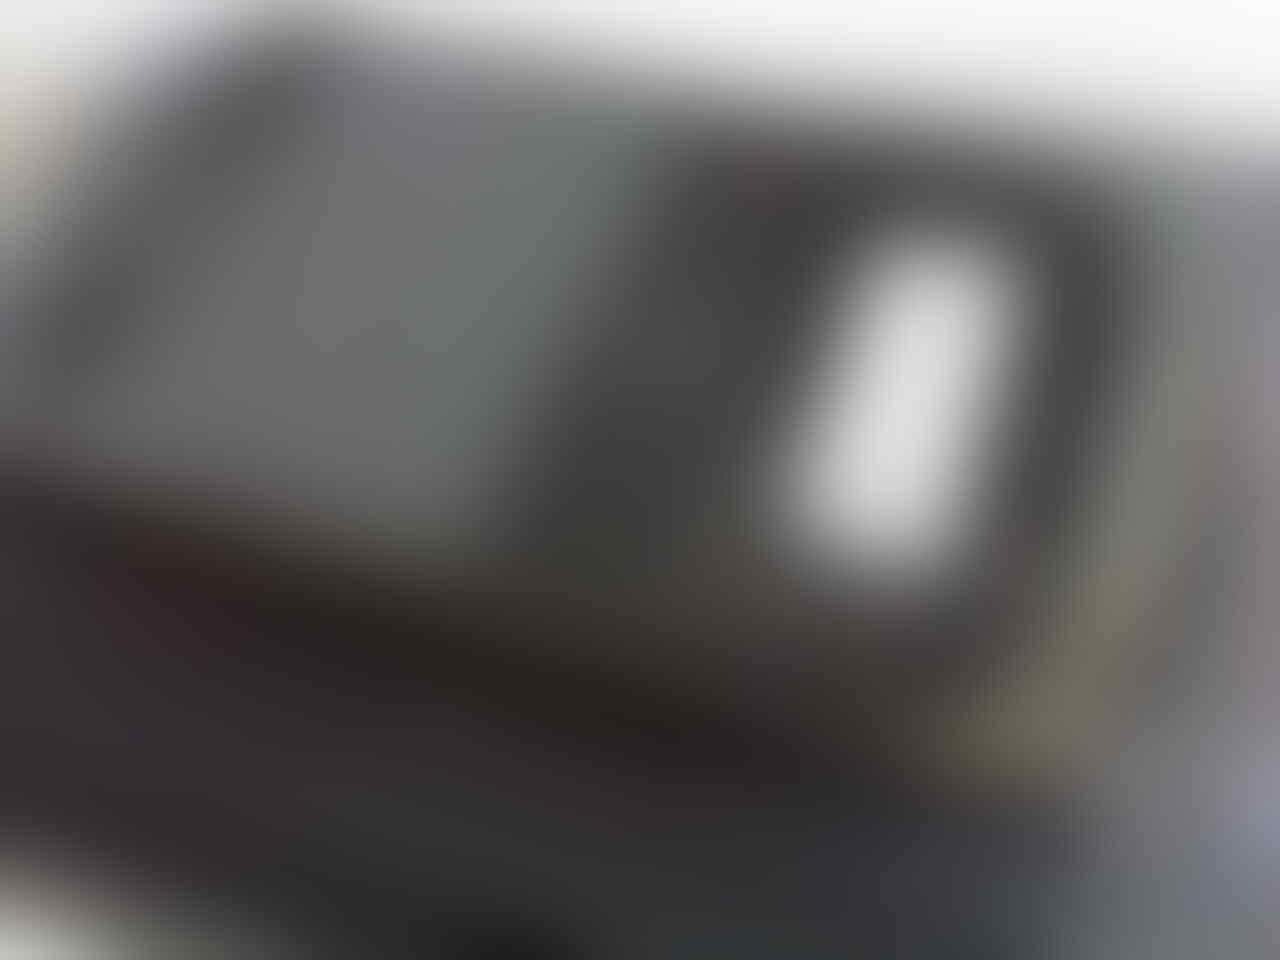 blackberry wynton 9310 cdma new garansi 2th segel gress ori pin mayan